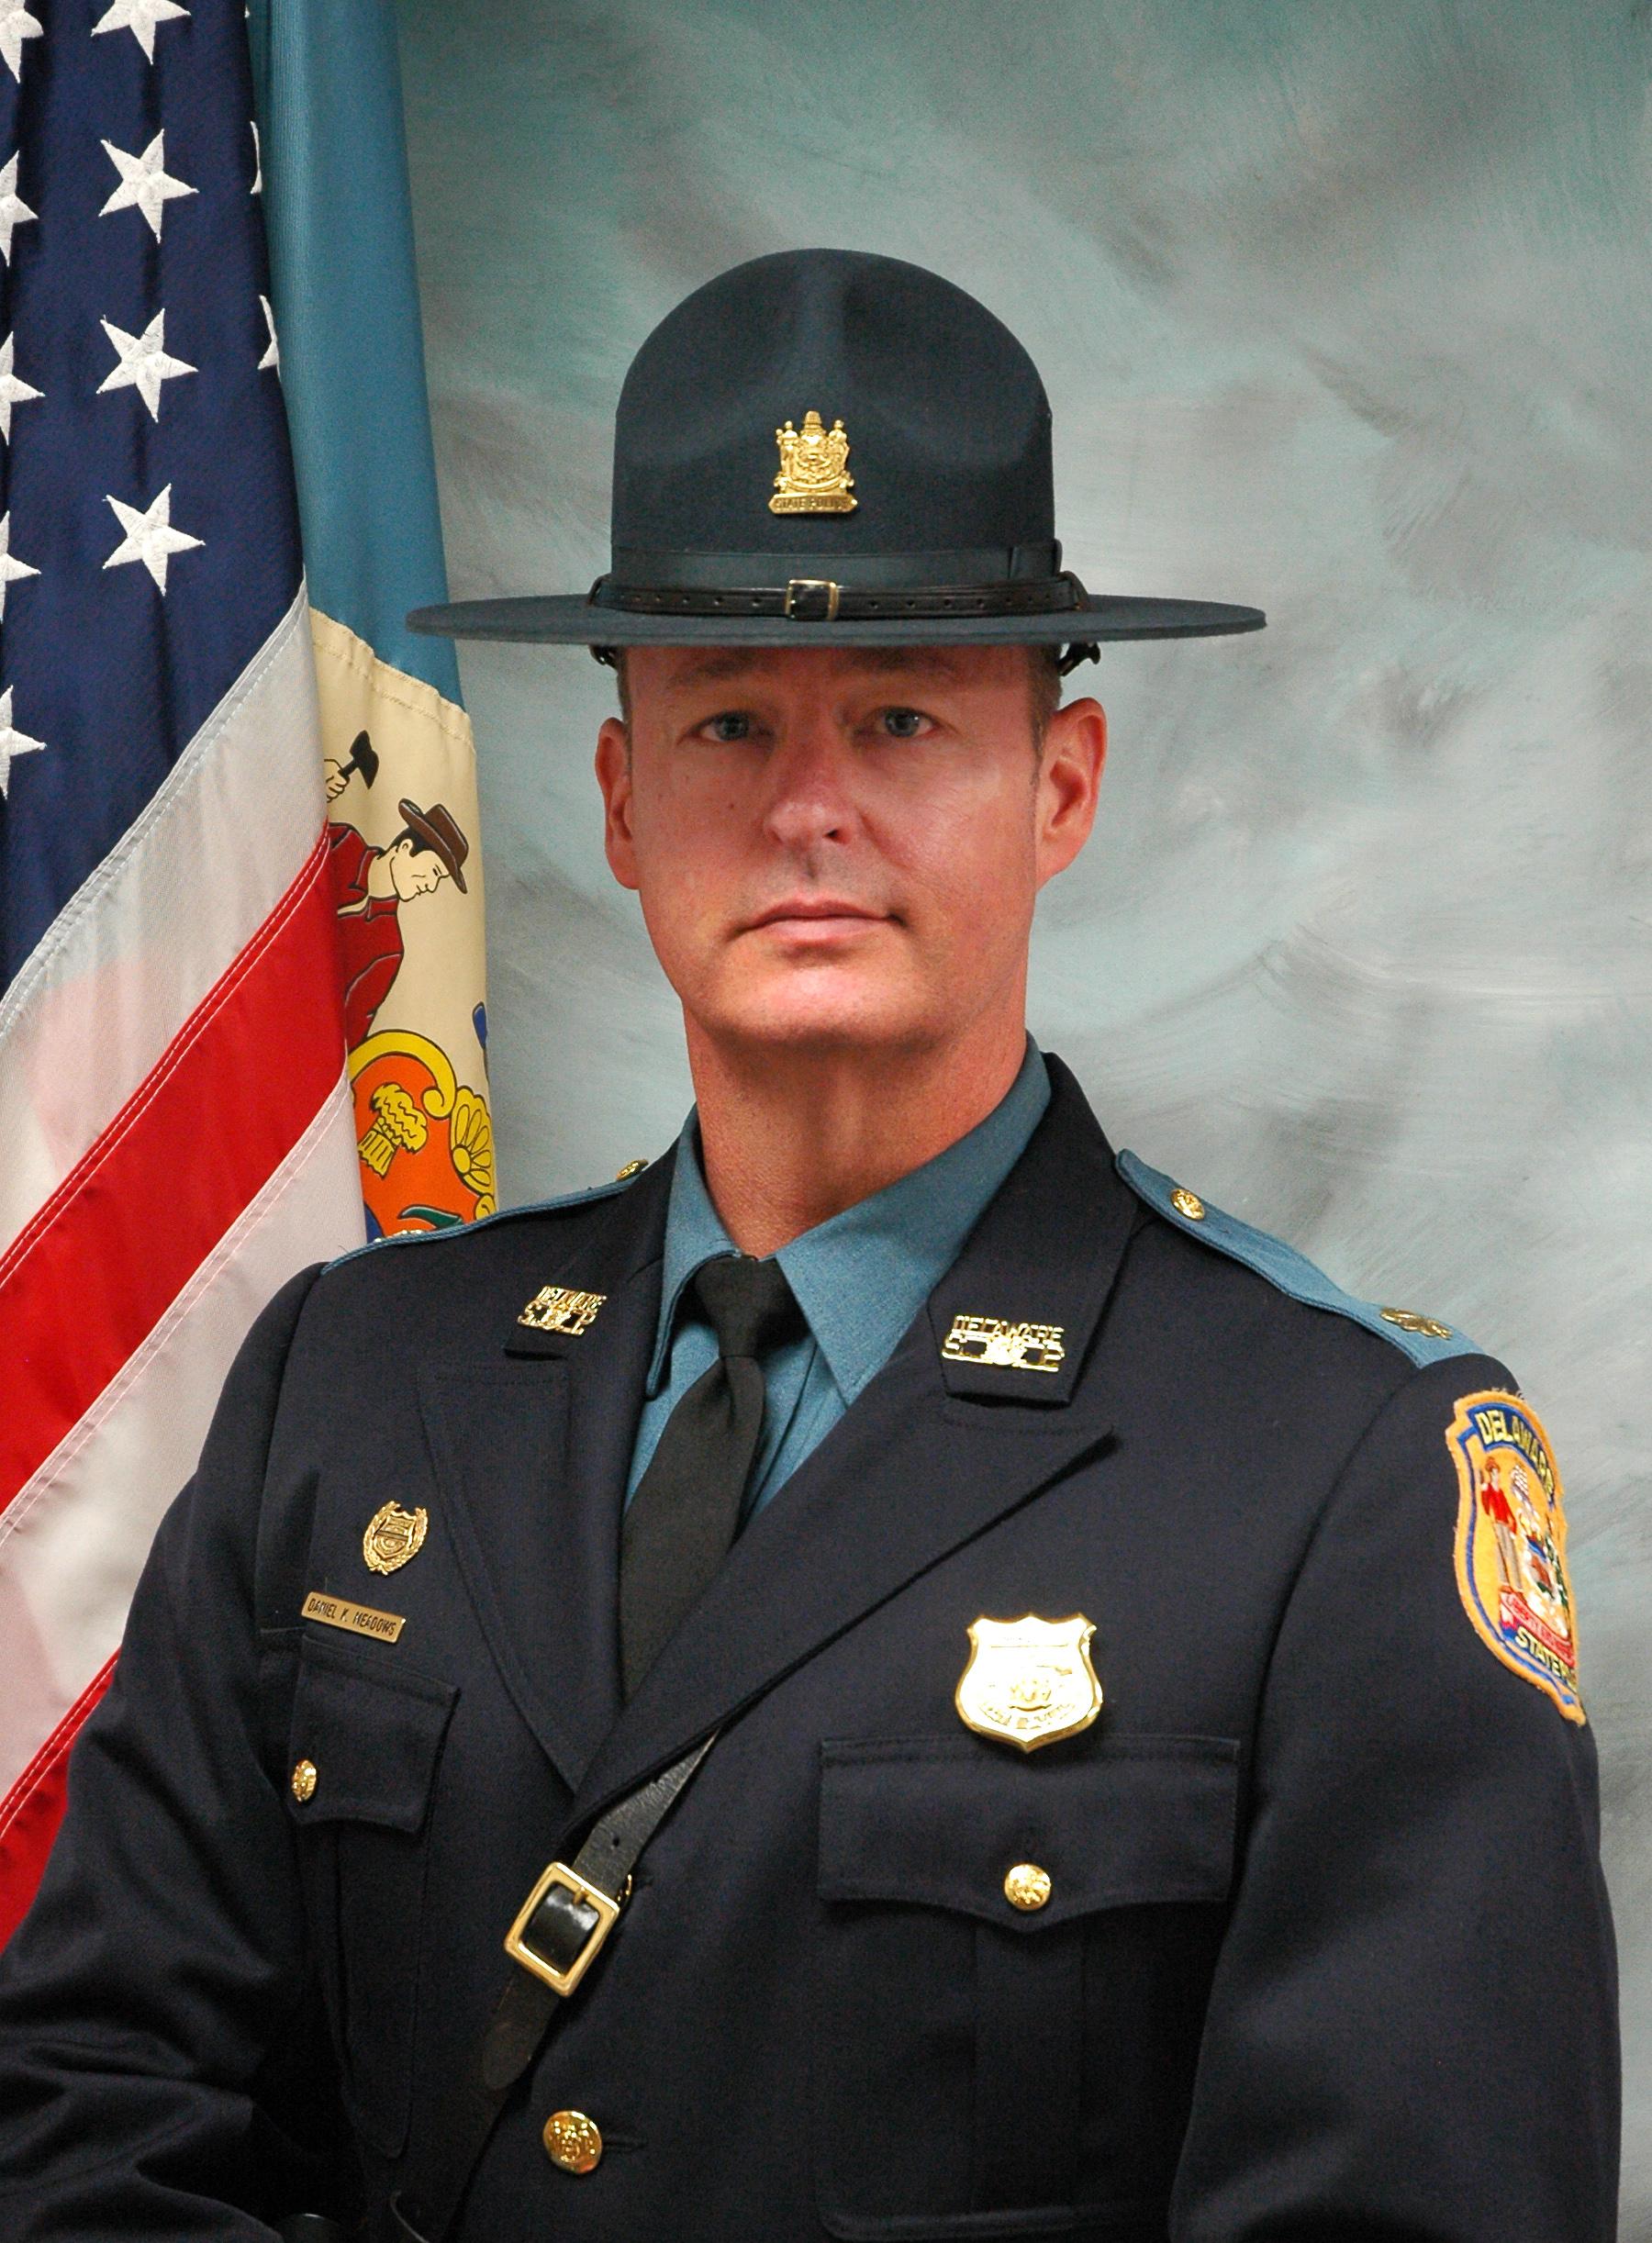 Major Daniel K. Meadows